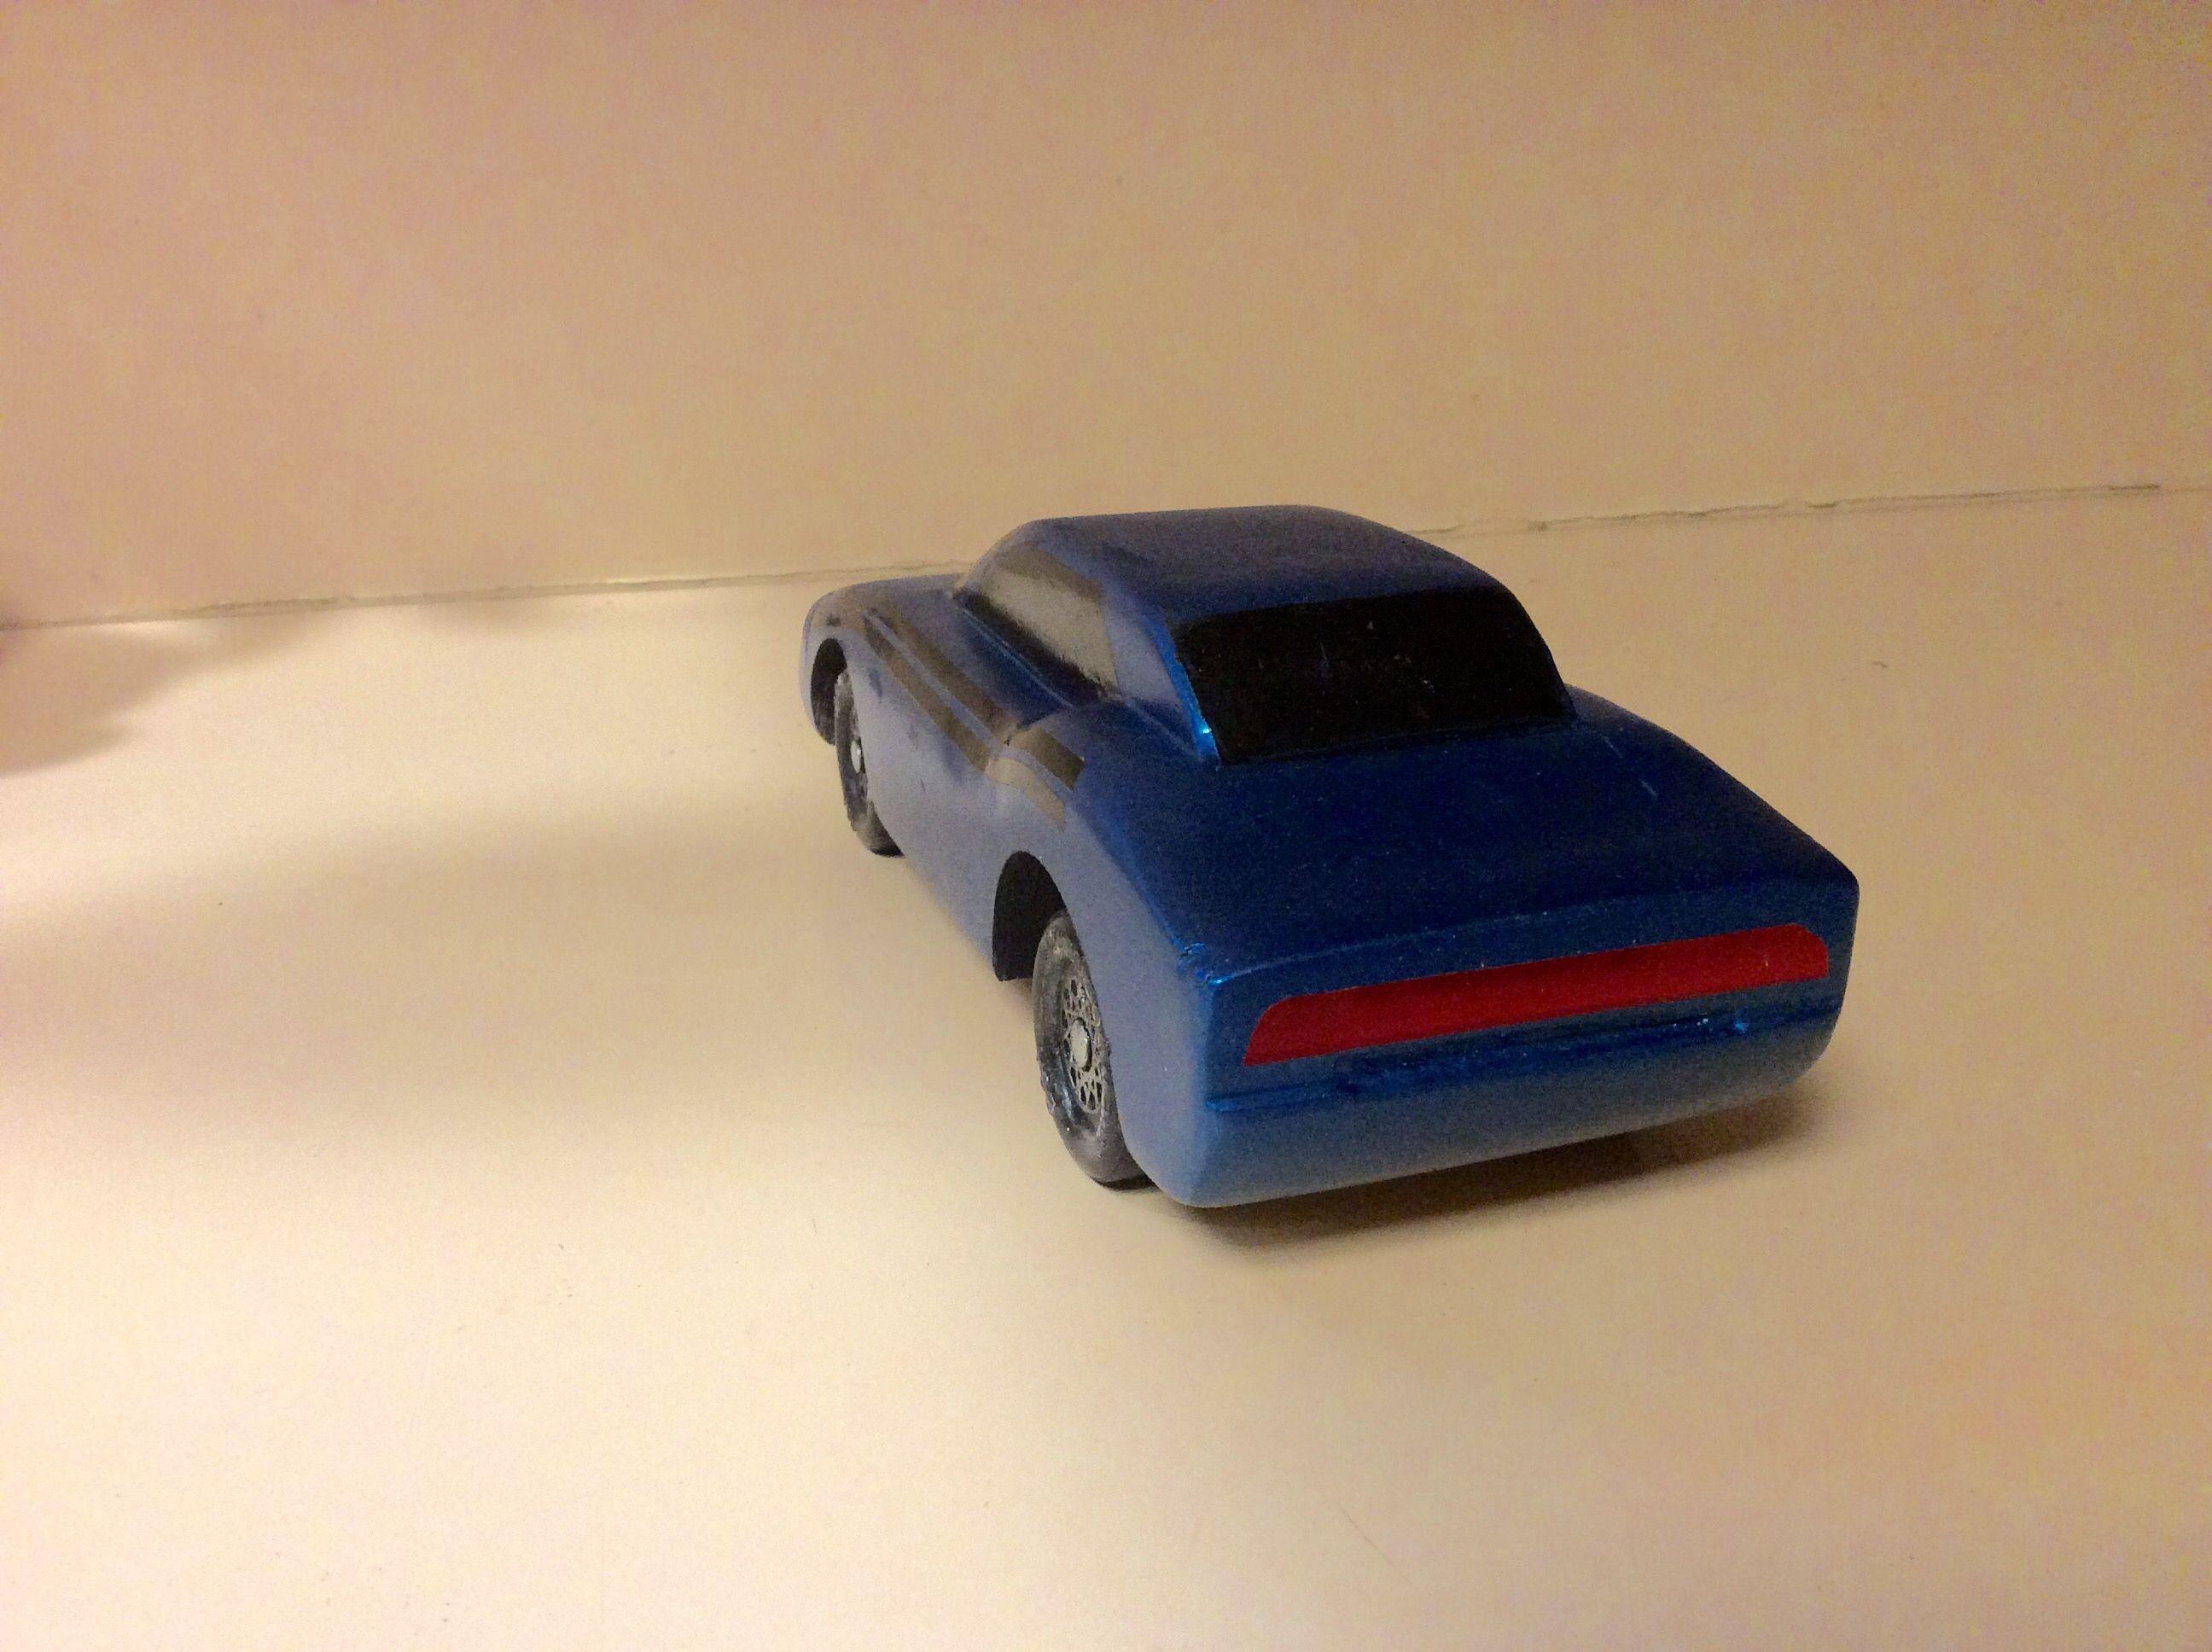 Pin de Tom Compton en Pinewood Derby Cars | Pinterest